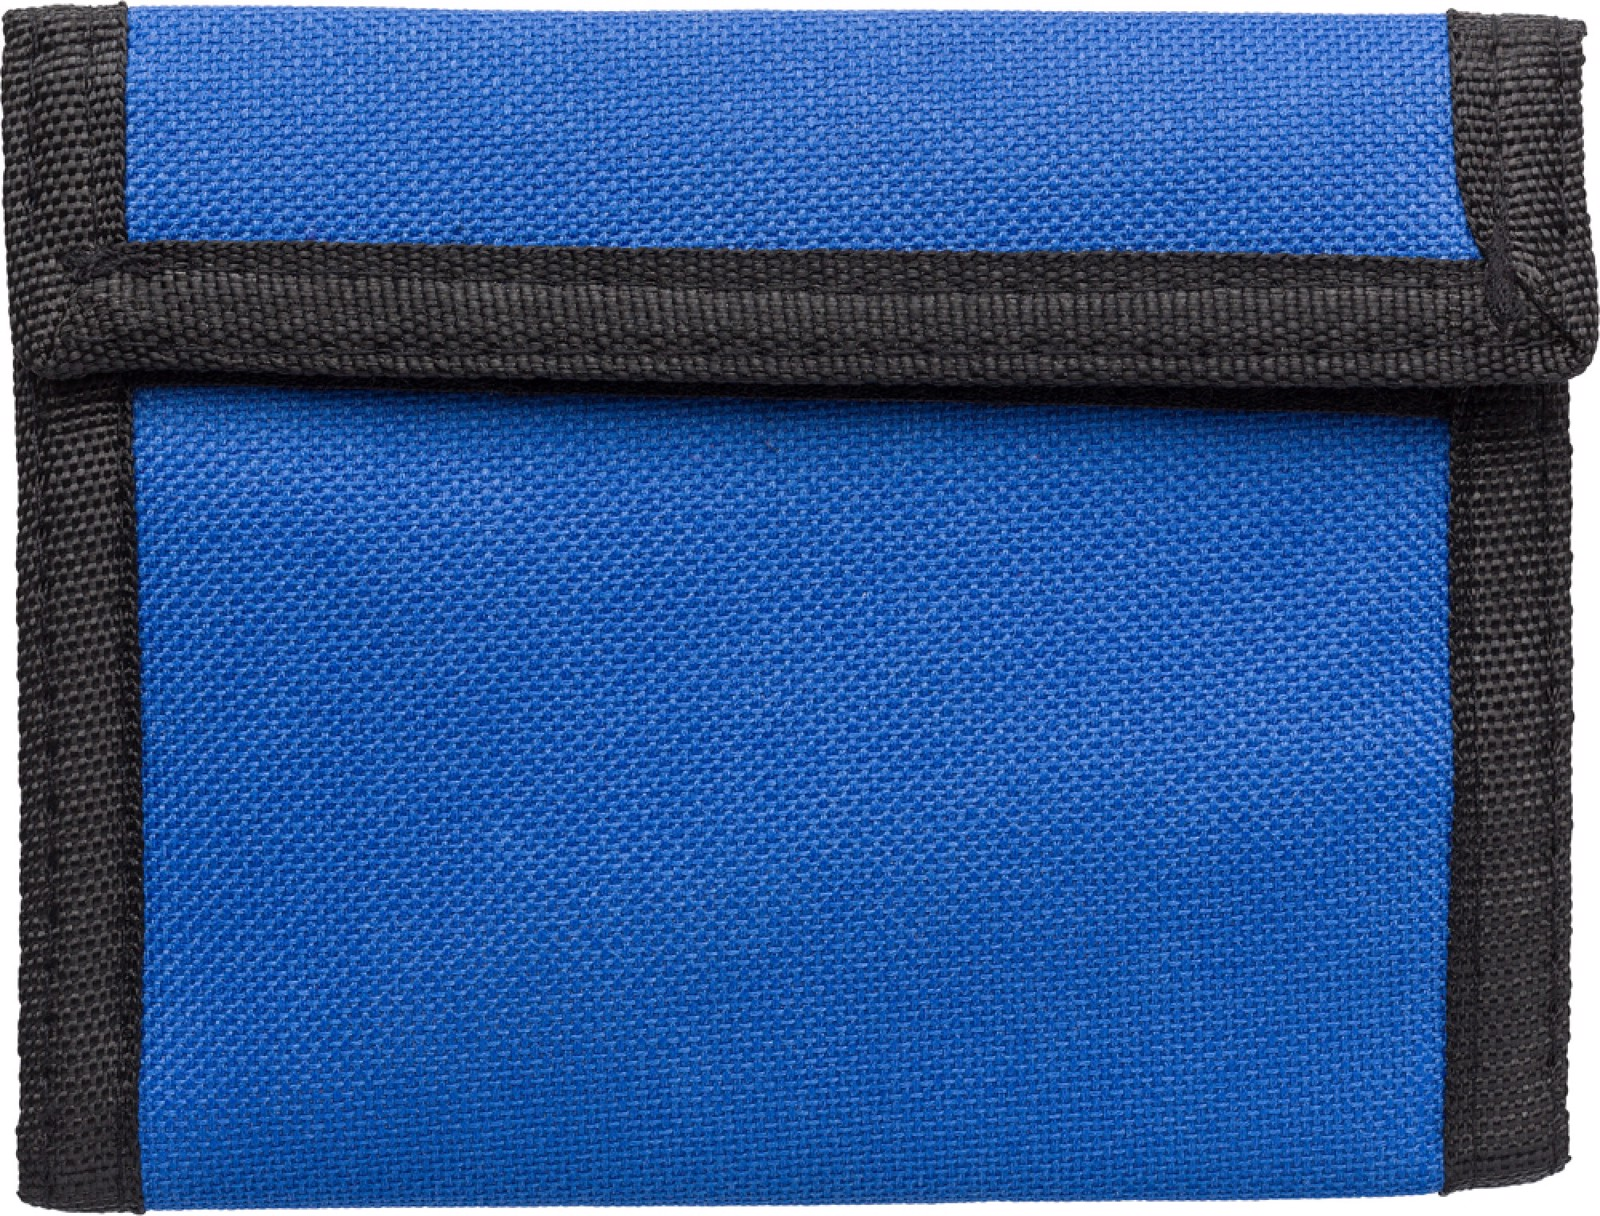 Polyester (190T + 600D) wallet - Cobalt Blue